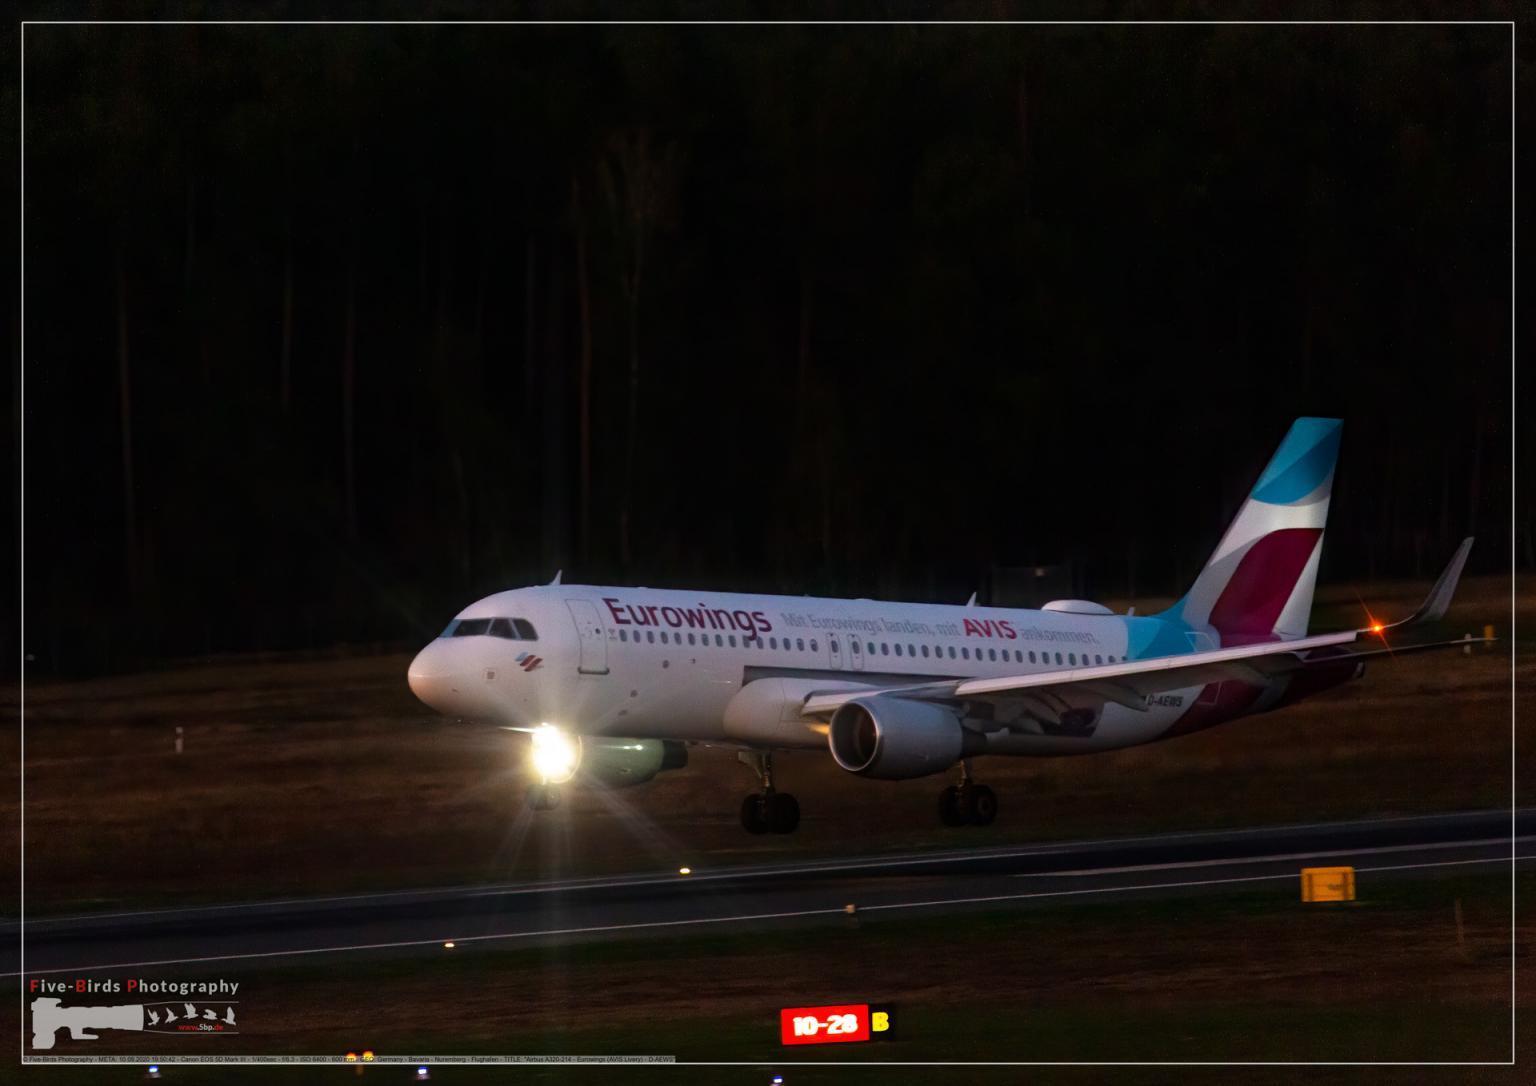 Airbus A320-214 - Eurowings (AVIS Livery) - D-AEWS